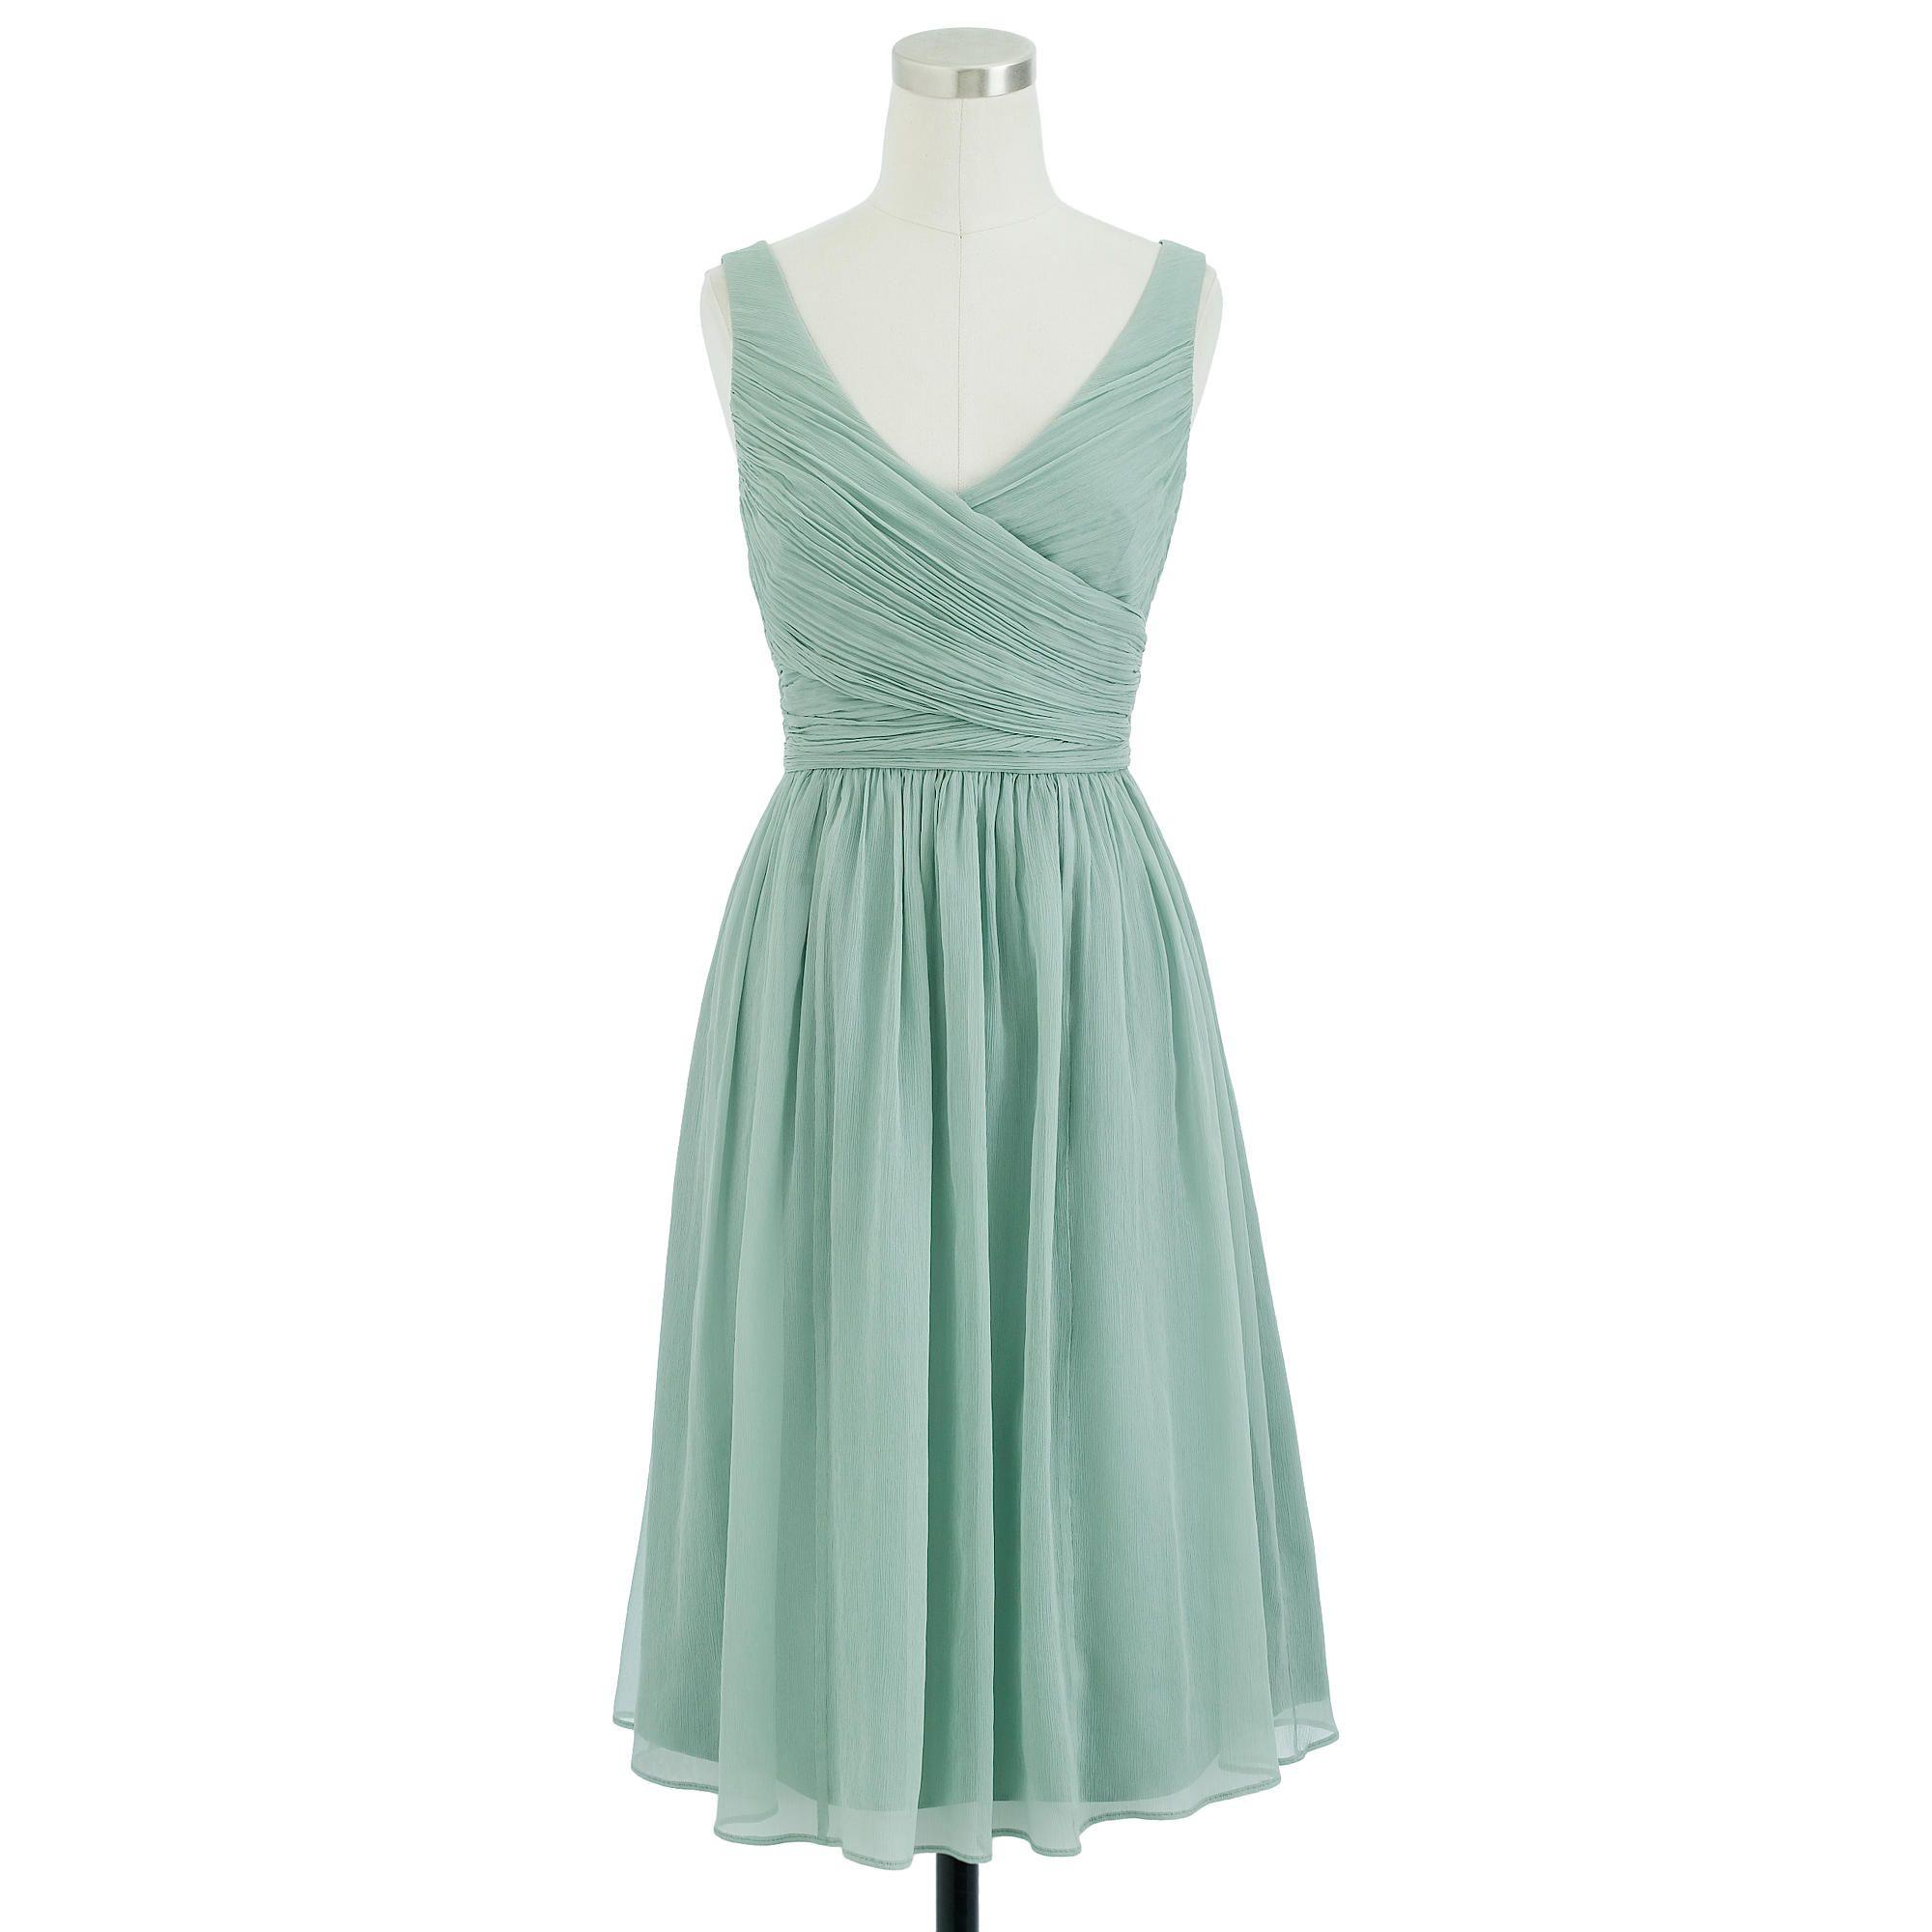 Tall heidi dress in silk chiffon weddings parties jew tall heidi dress in silk chiffon weddings parties jew ombrellifo Choice Image